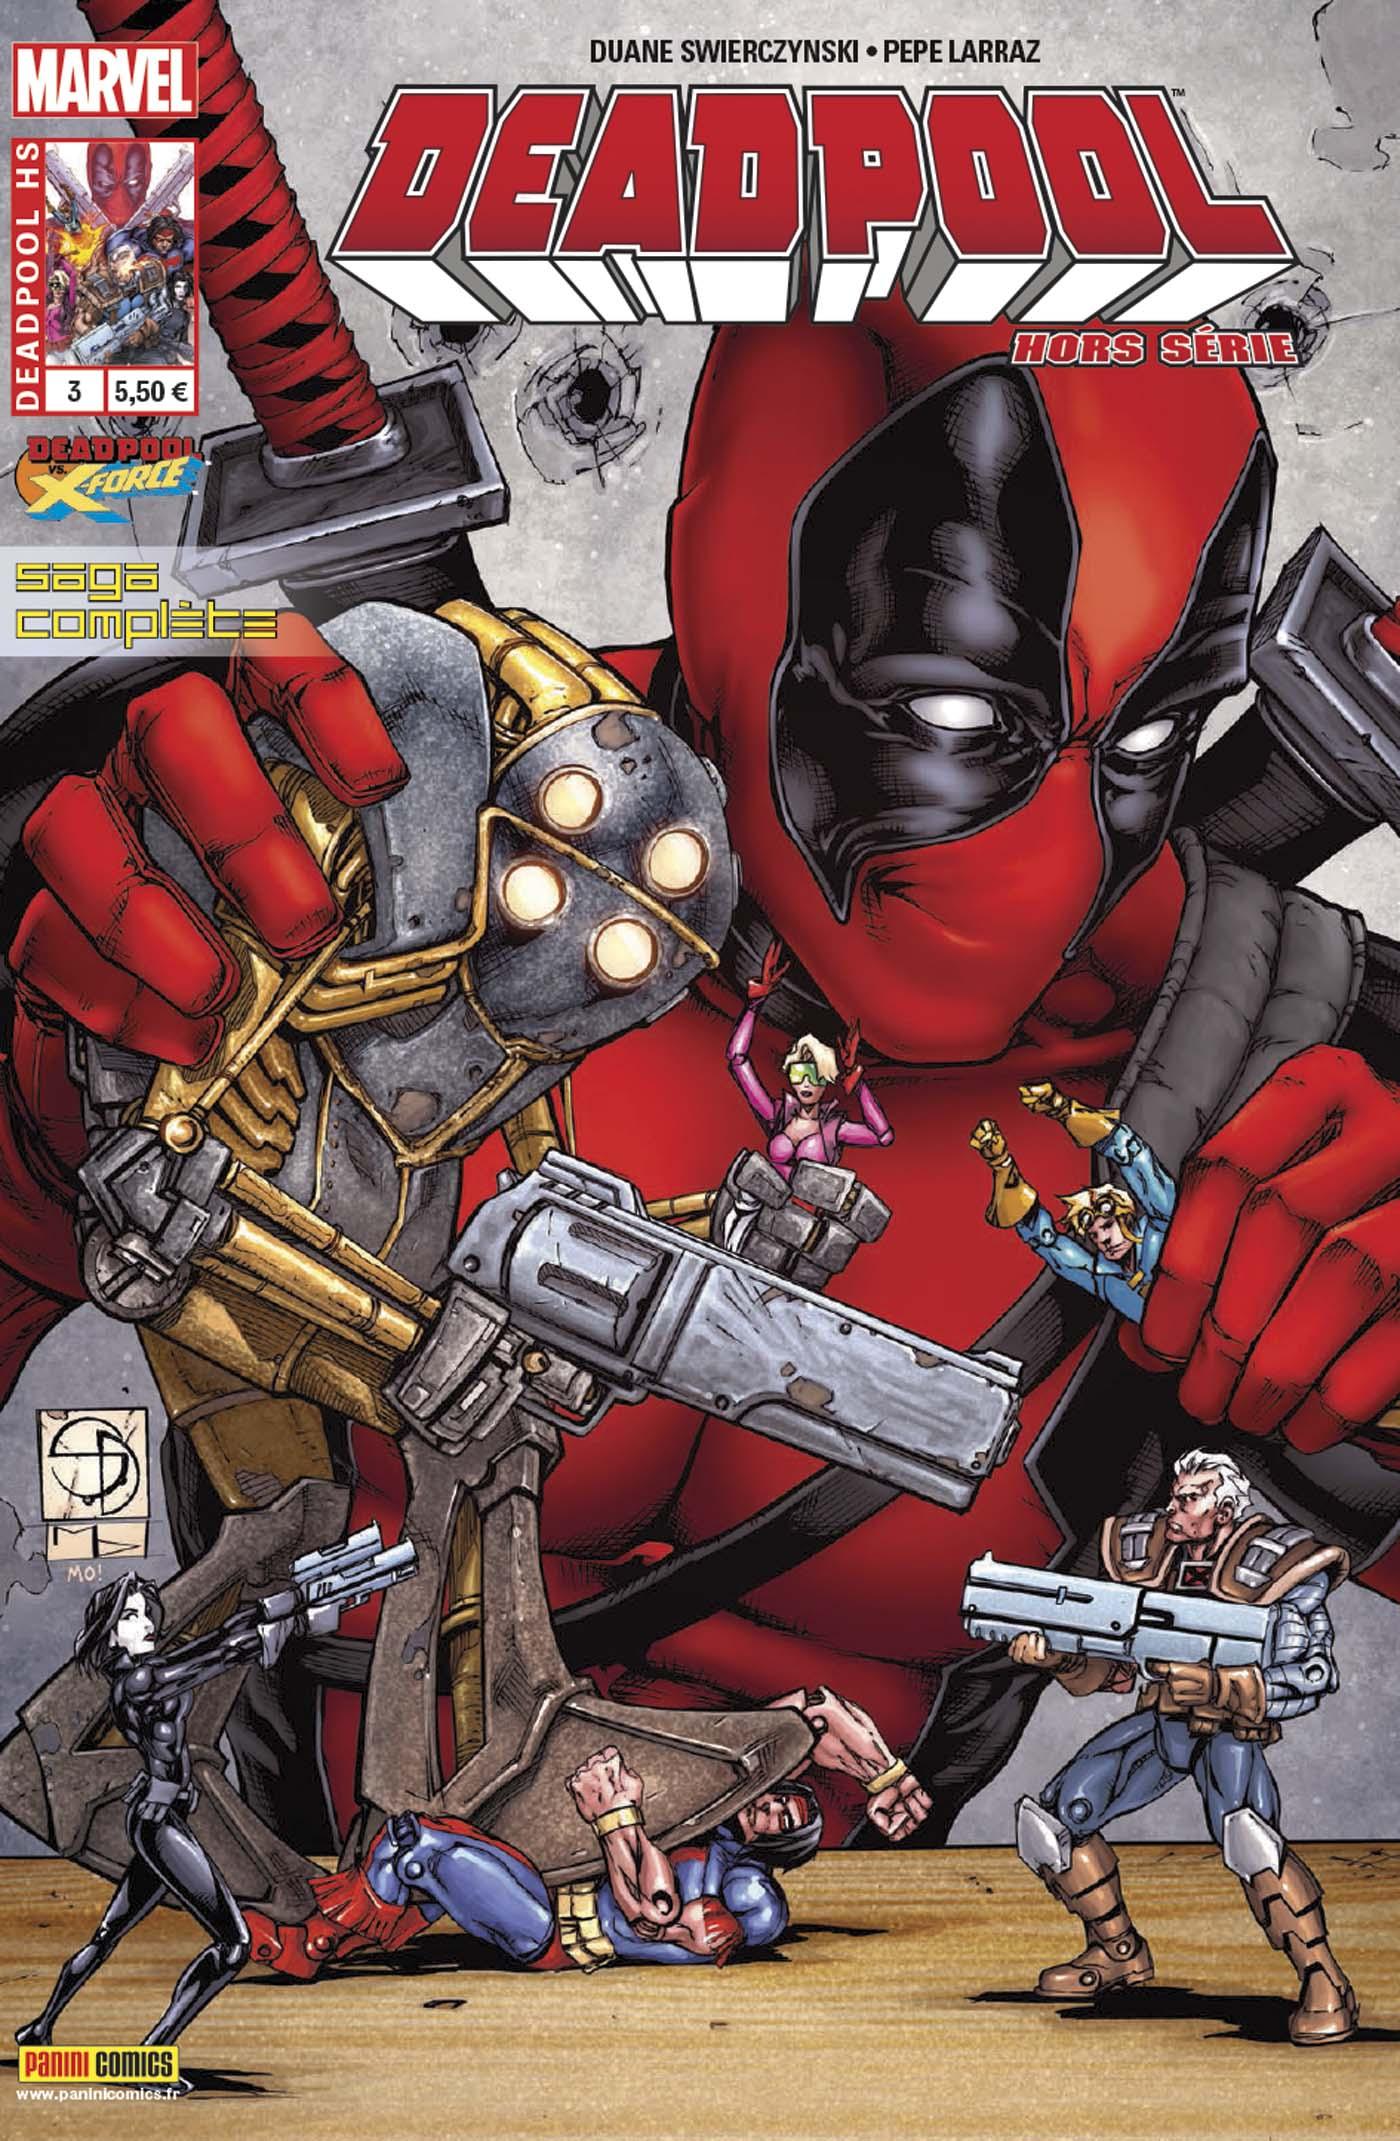 img_comics_8728_deadpool-hors-serie-3-deadpool-vs-x-force